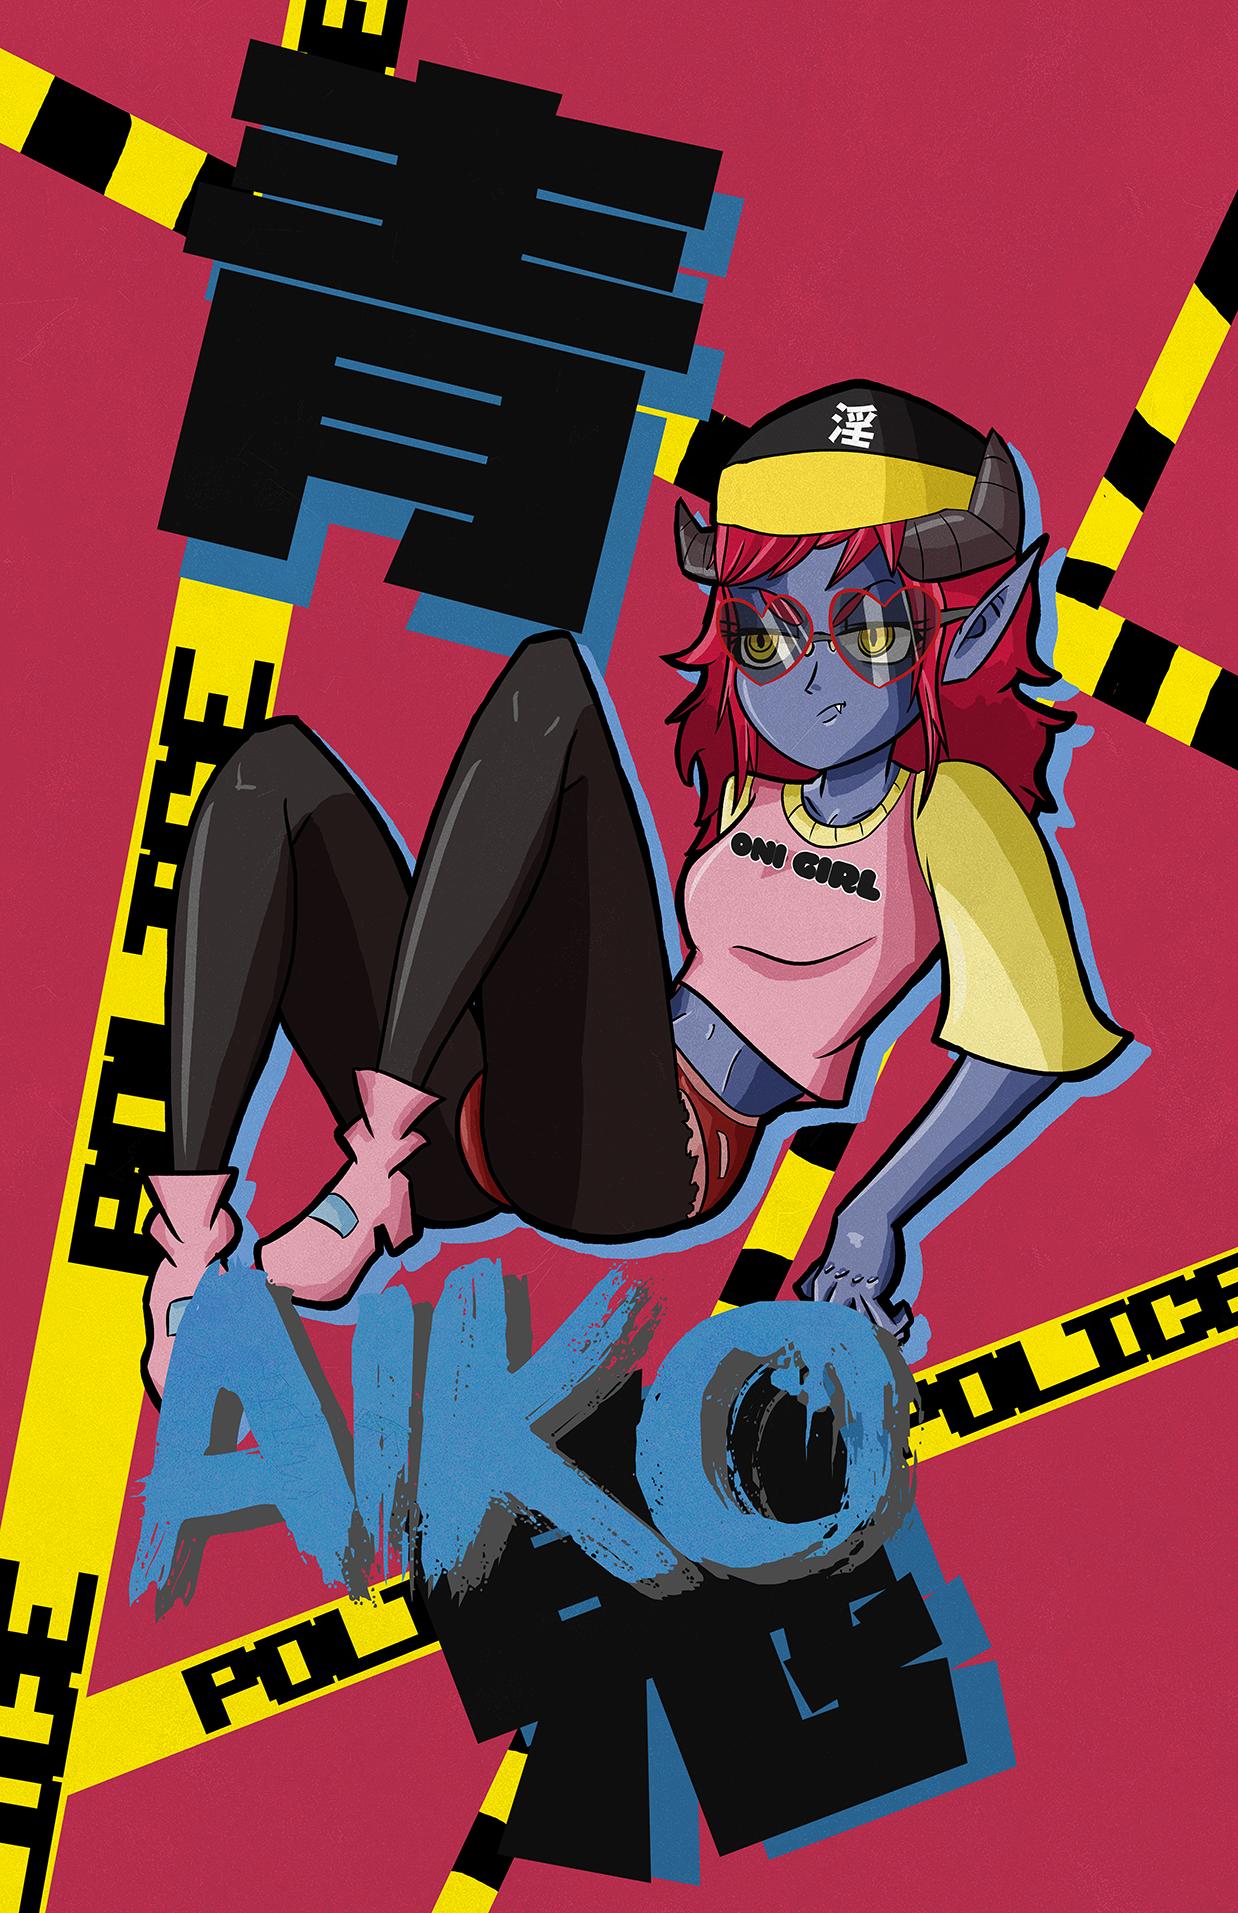 AIKO pin up